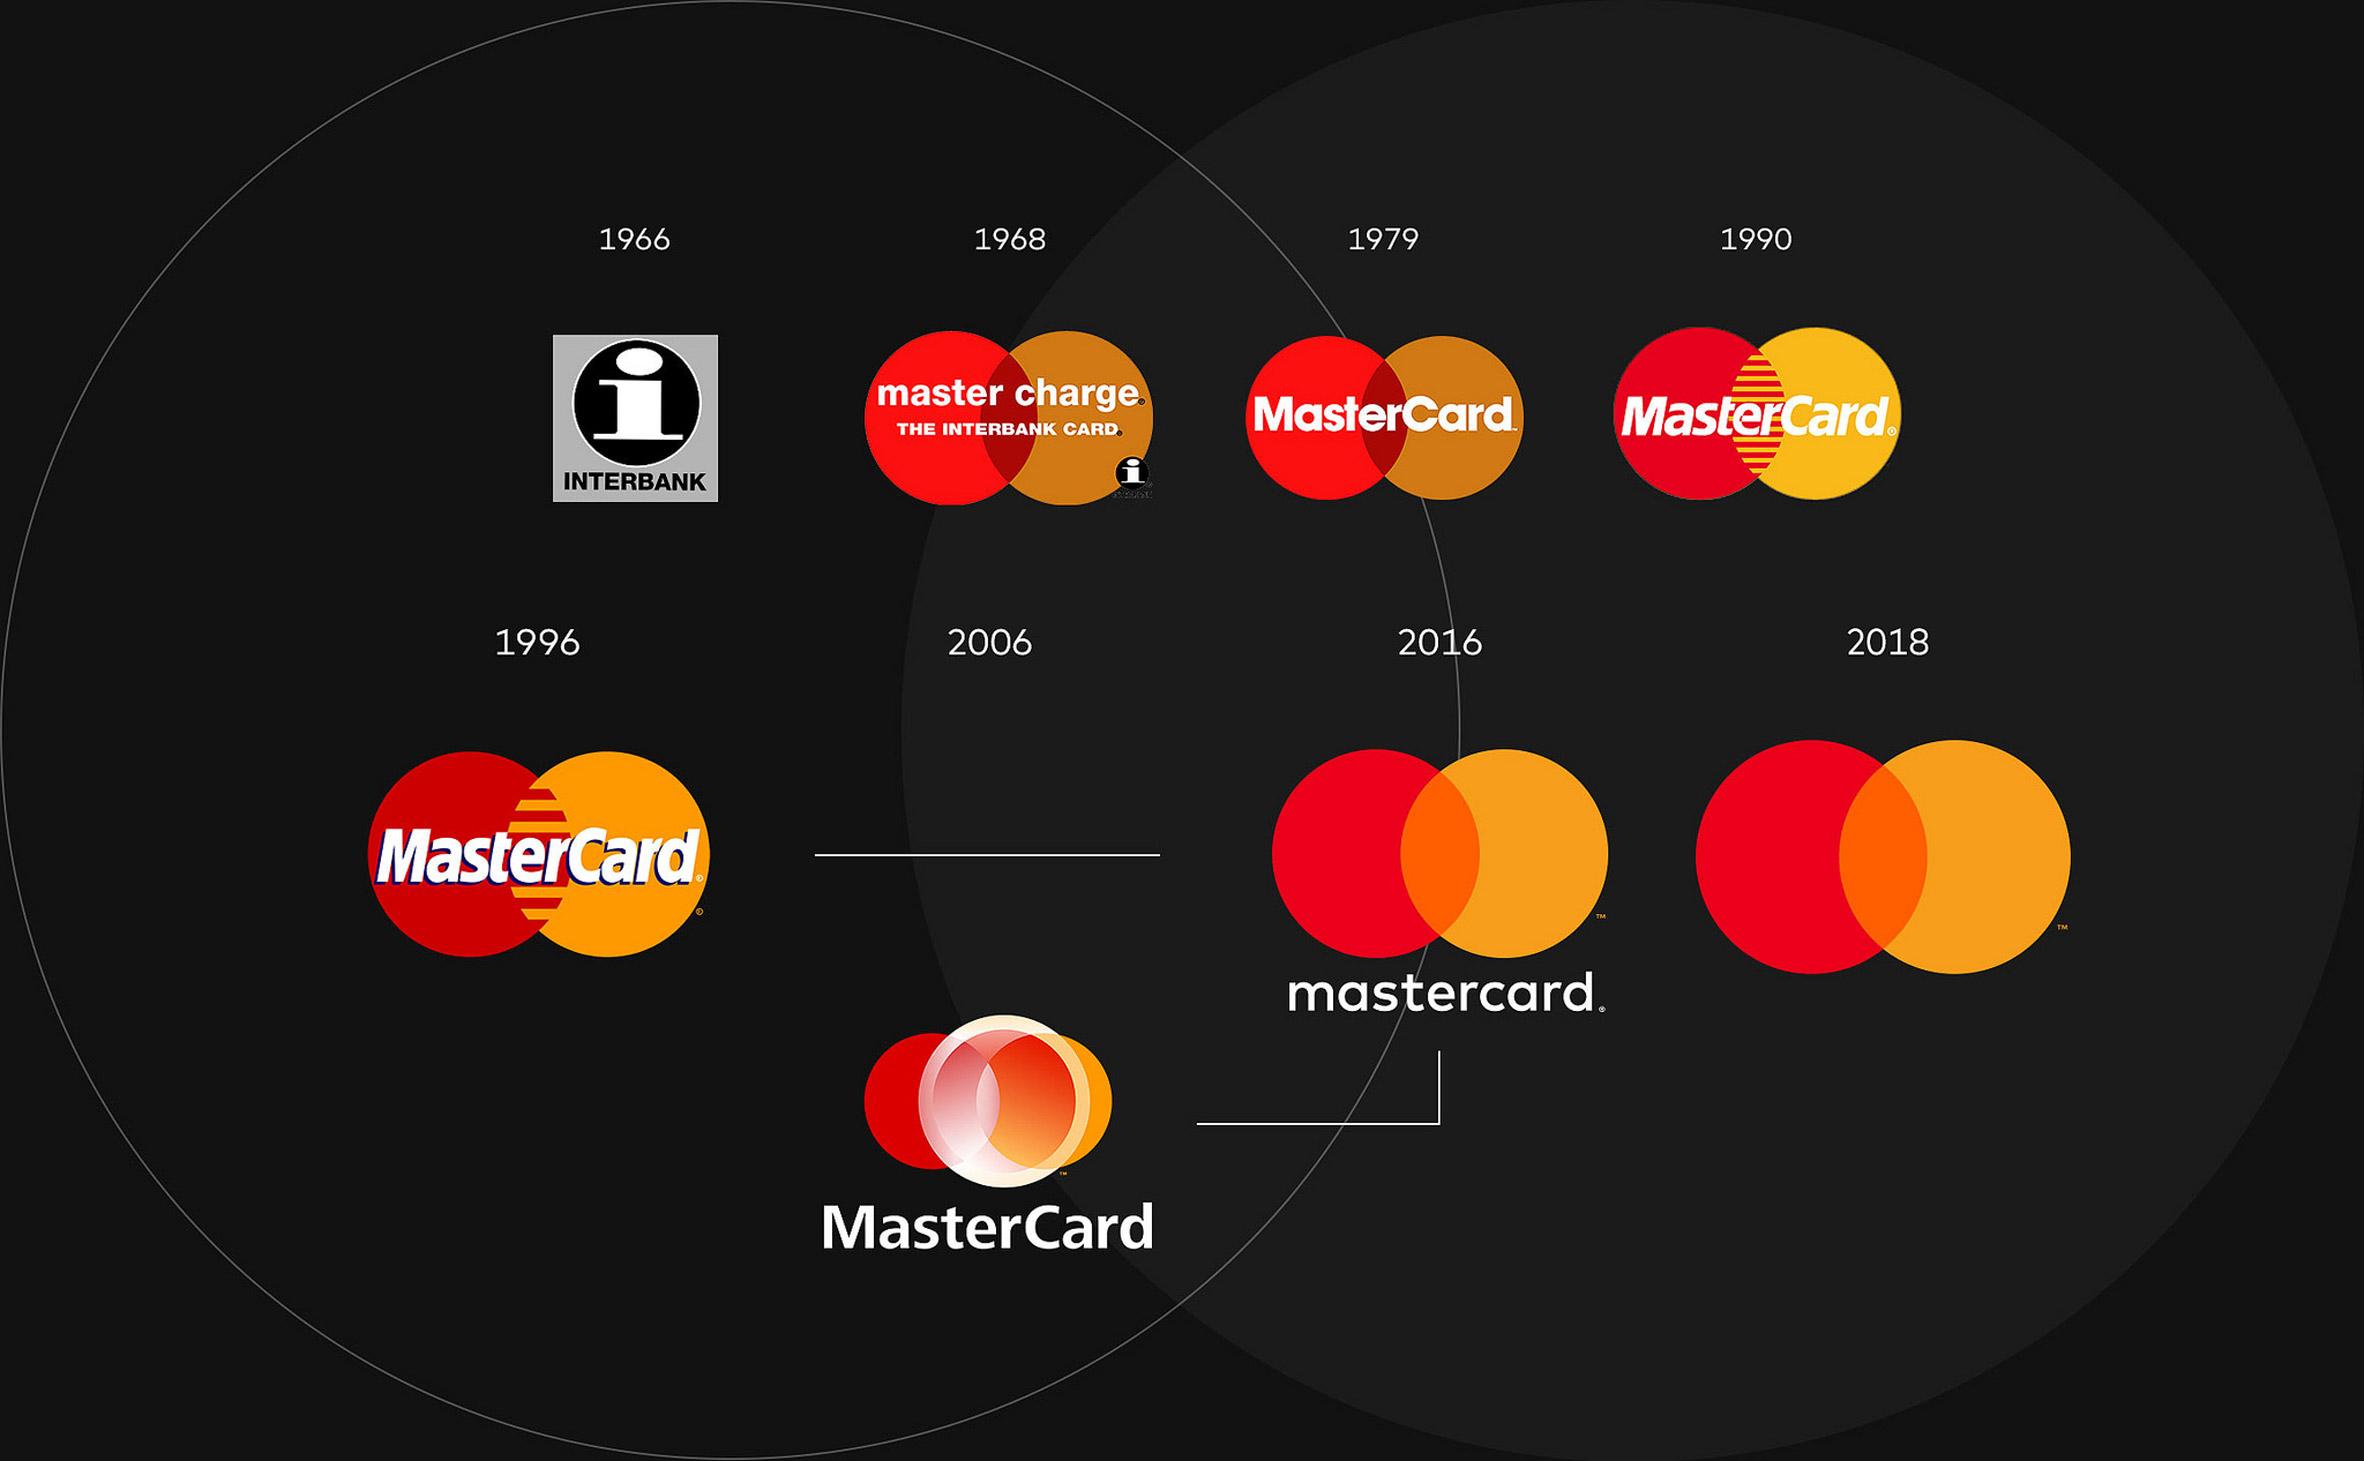 MasterCard 3